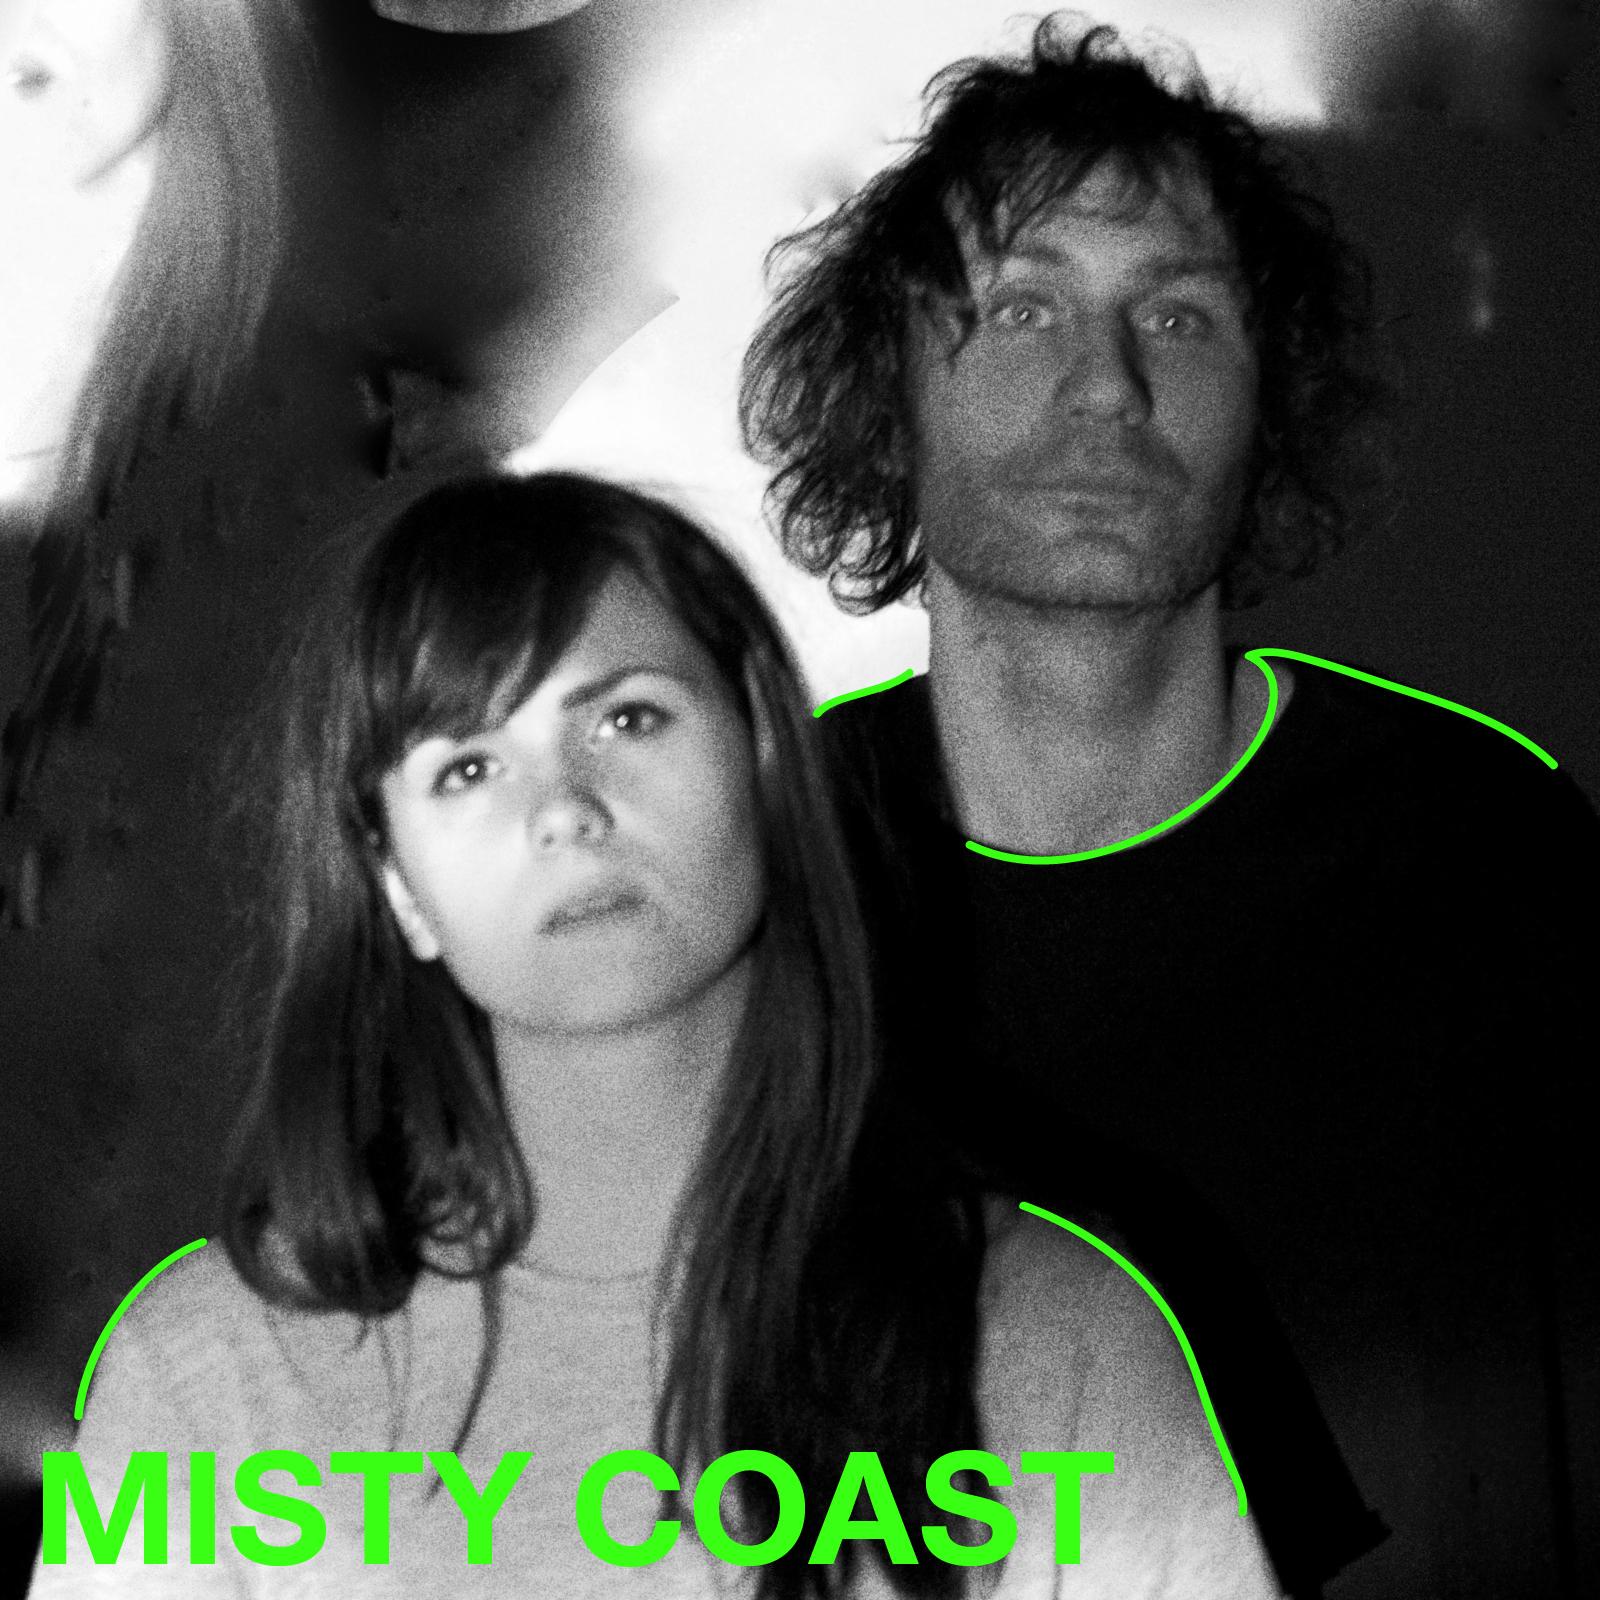 Misty Coast